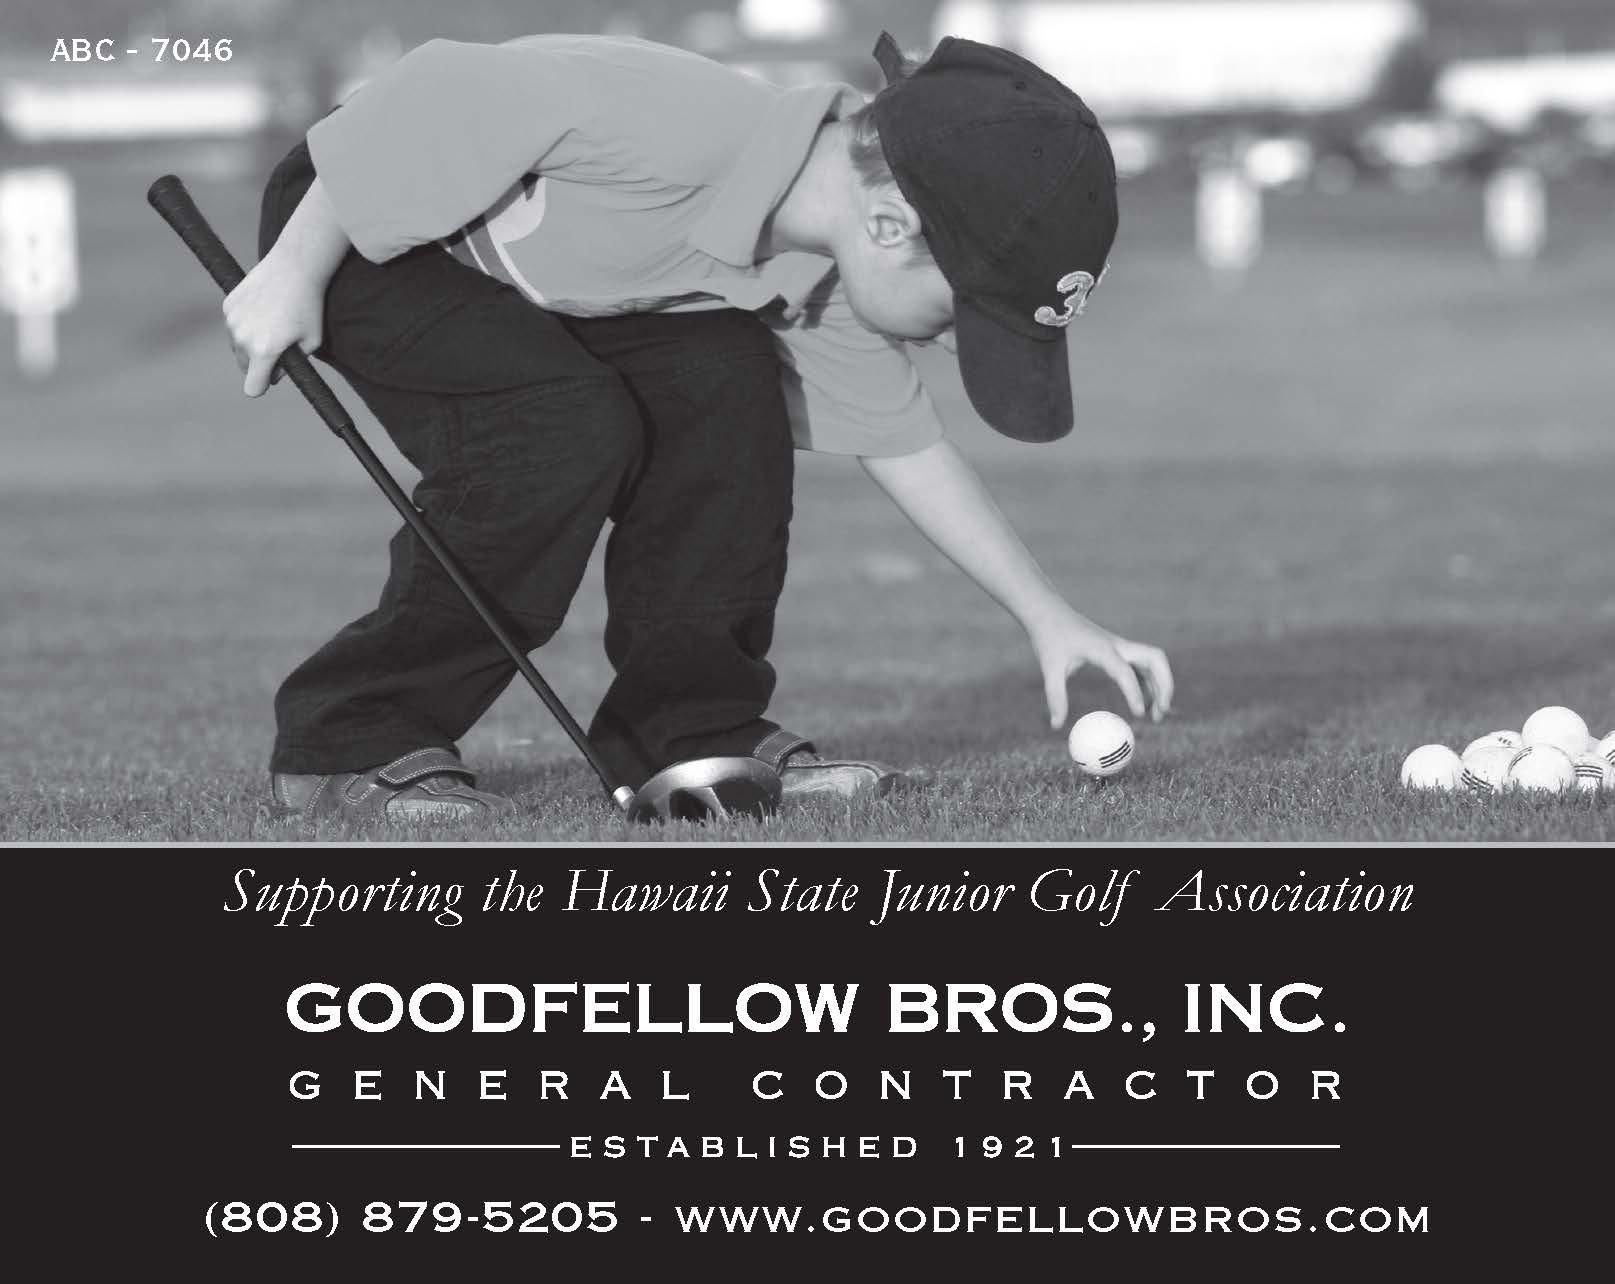 Hawaii State Junior Golf Association Sponsorship 2013 (5.5 in. x 4.25 in.)  (596K)